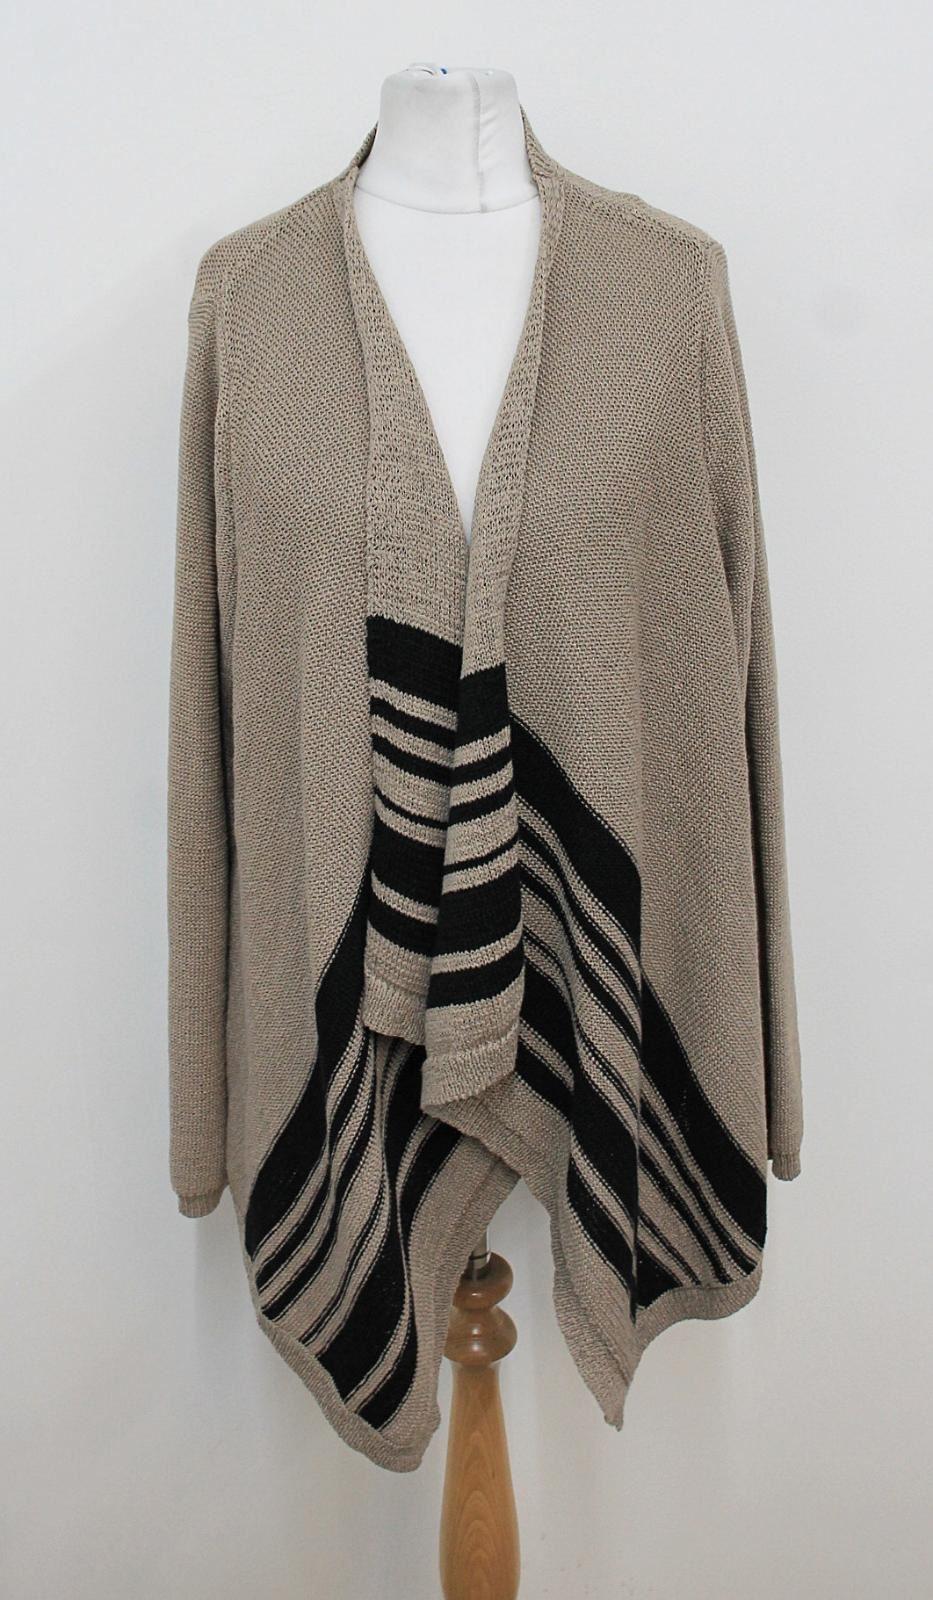 LAURA-ASHLEY-Ladies-Sand-Beige-Black-Striped-Waterfall-Cardigan-Size-UK14